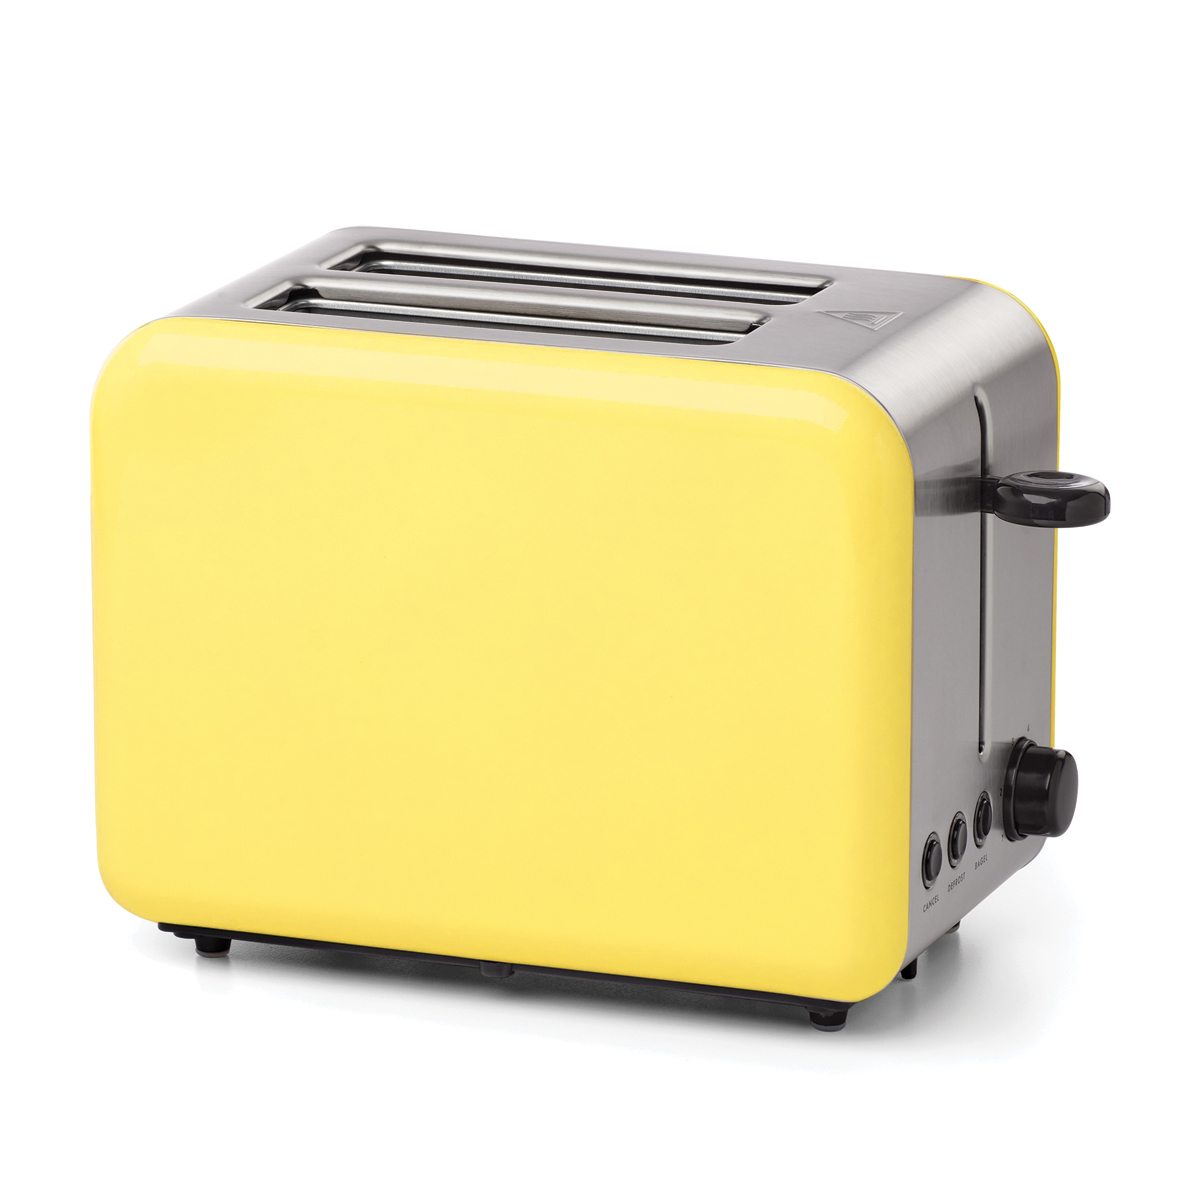 Kate Spade New York, Lenox Electrics Yellow Toaster